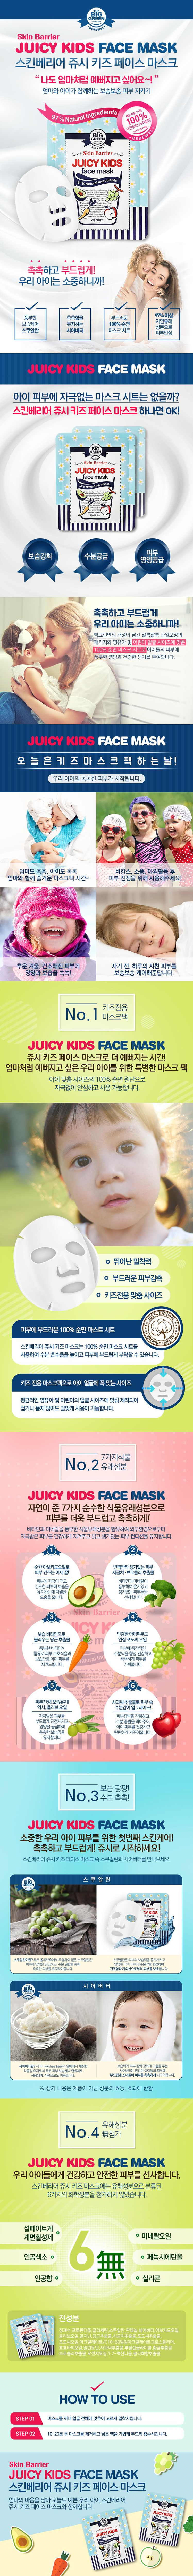 bb_kidsmask.jpg